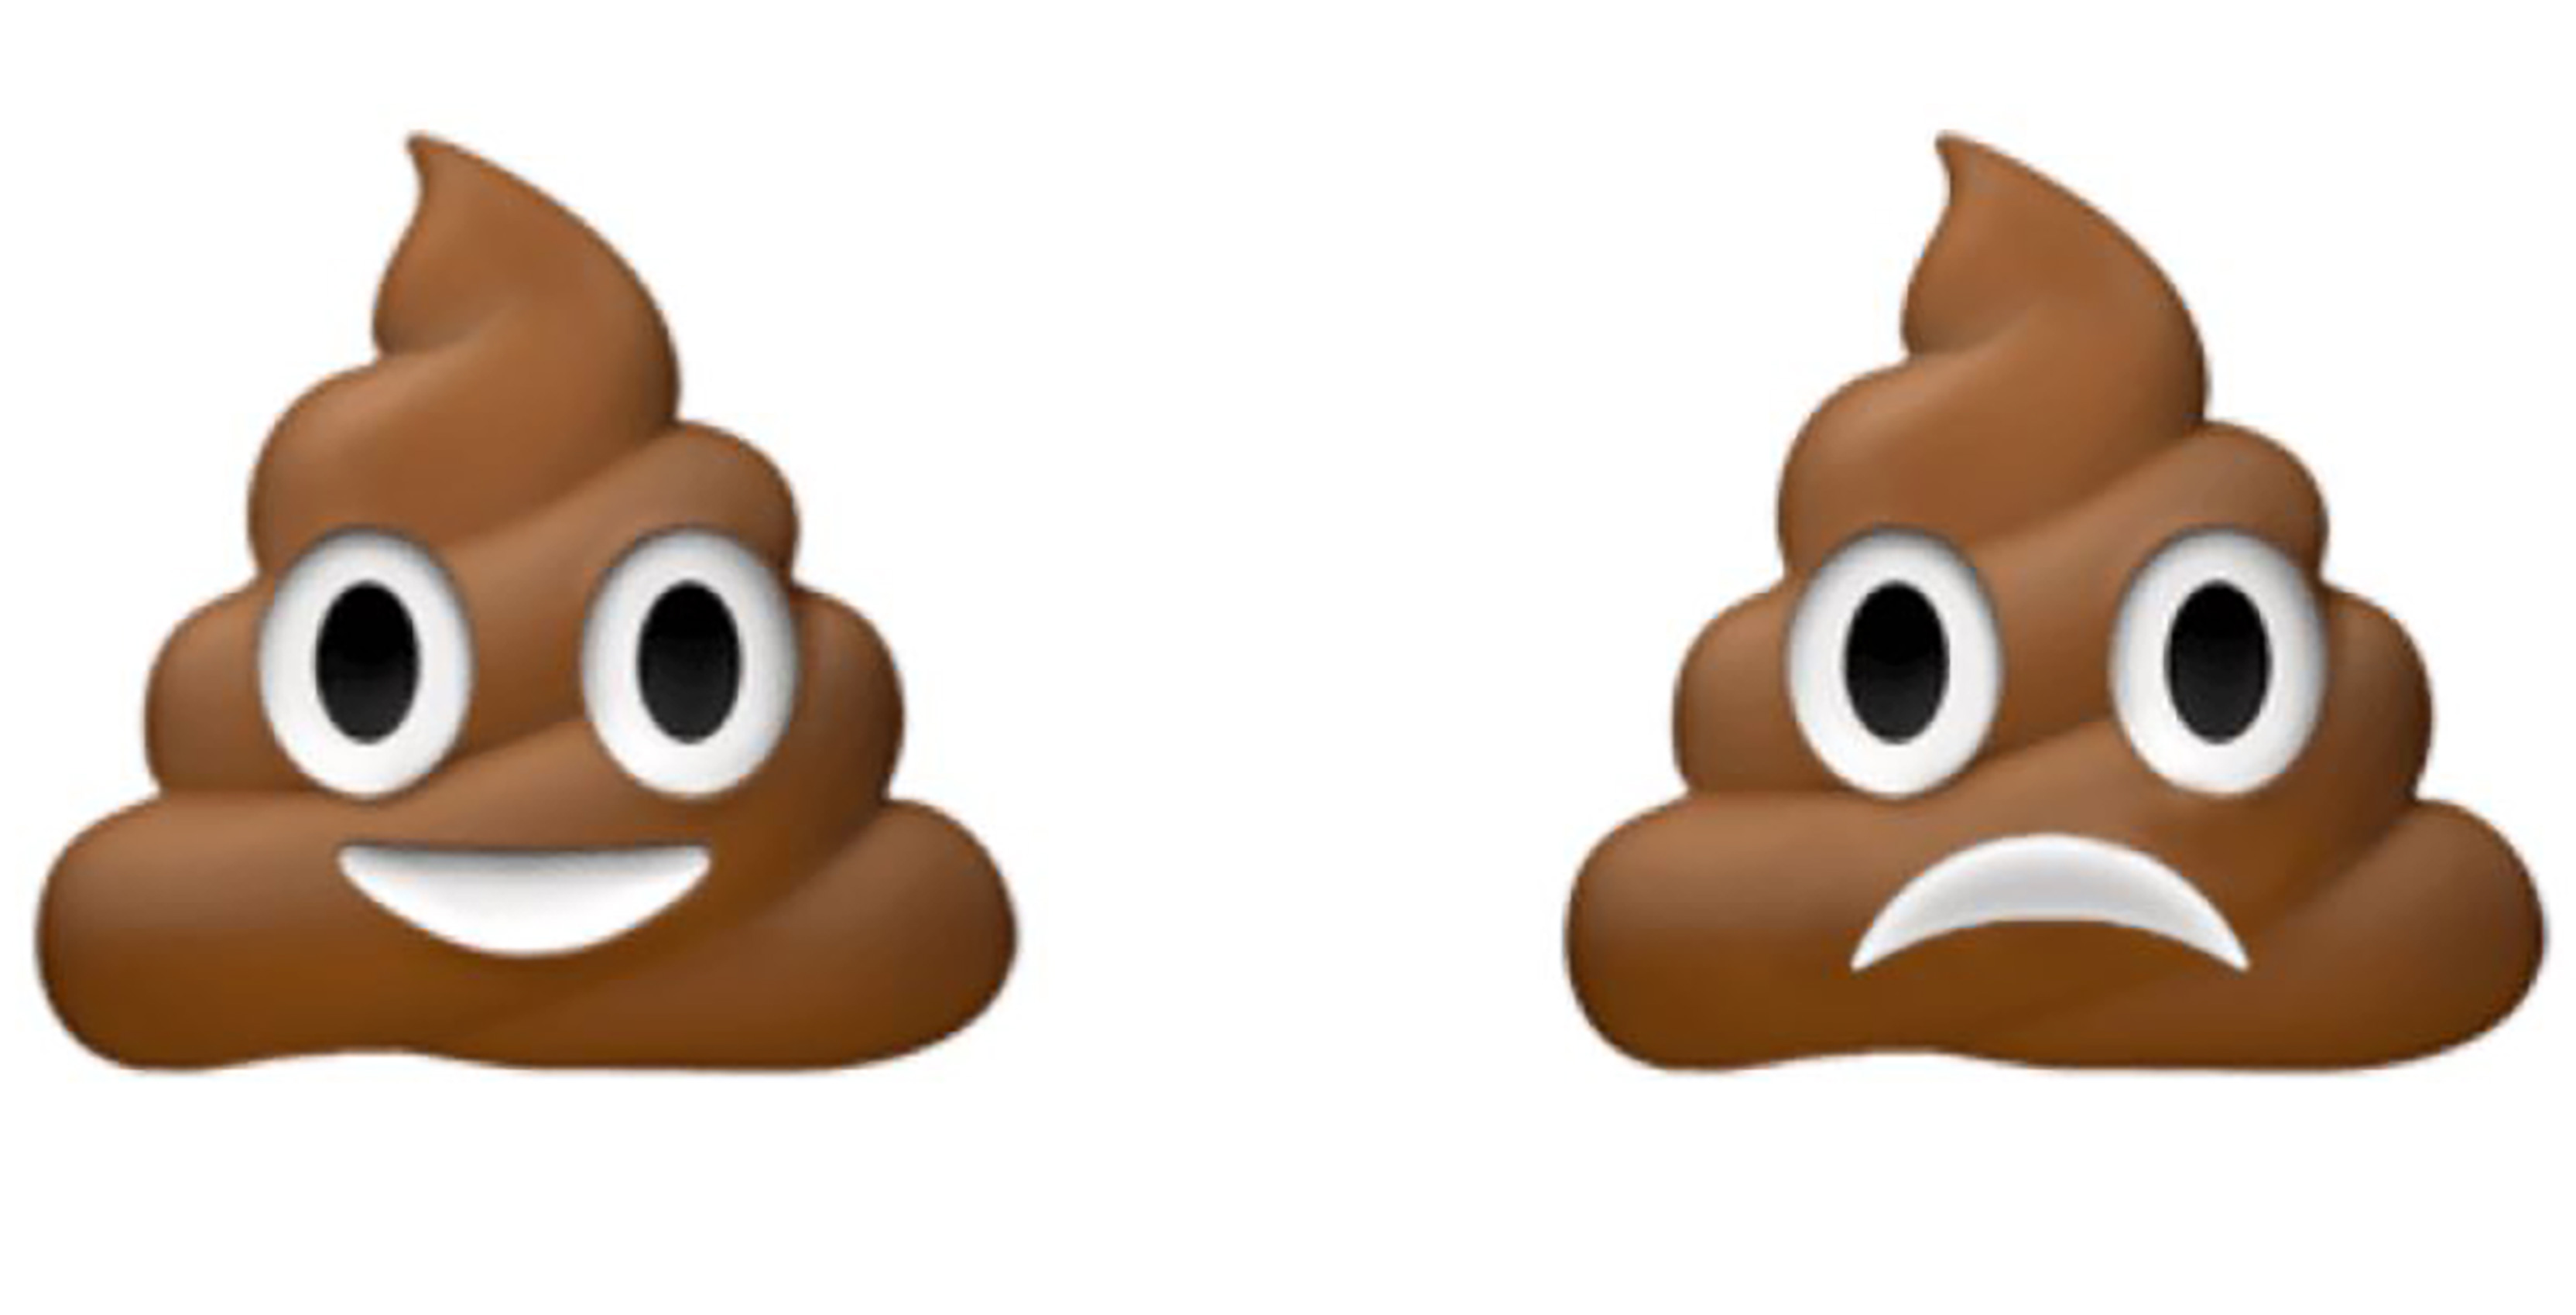 how to draw a turd emoji